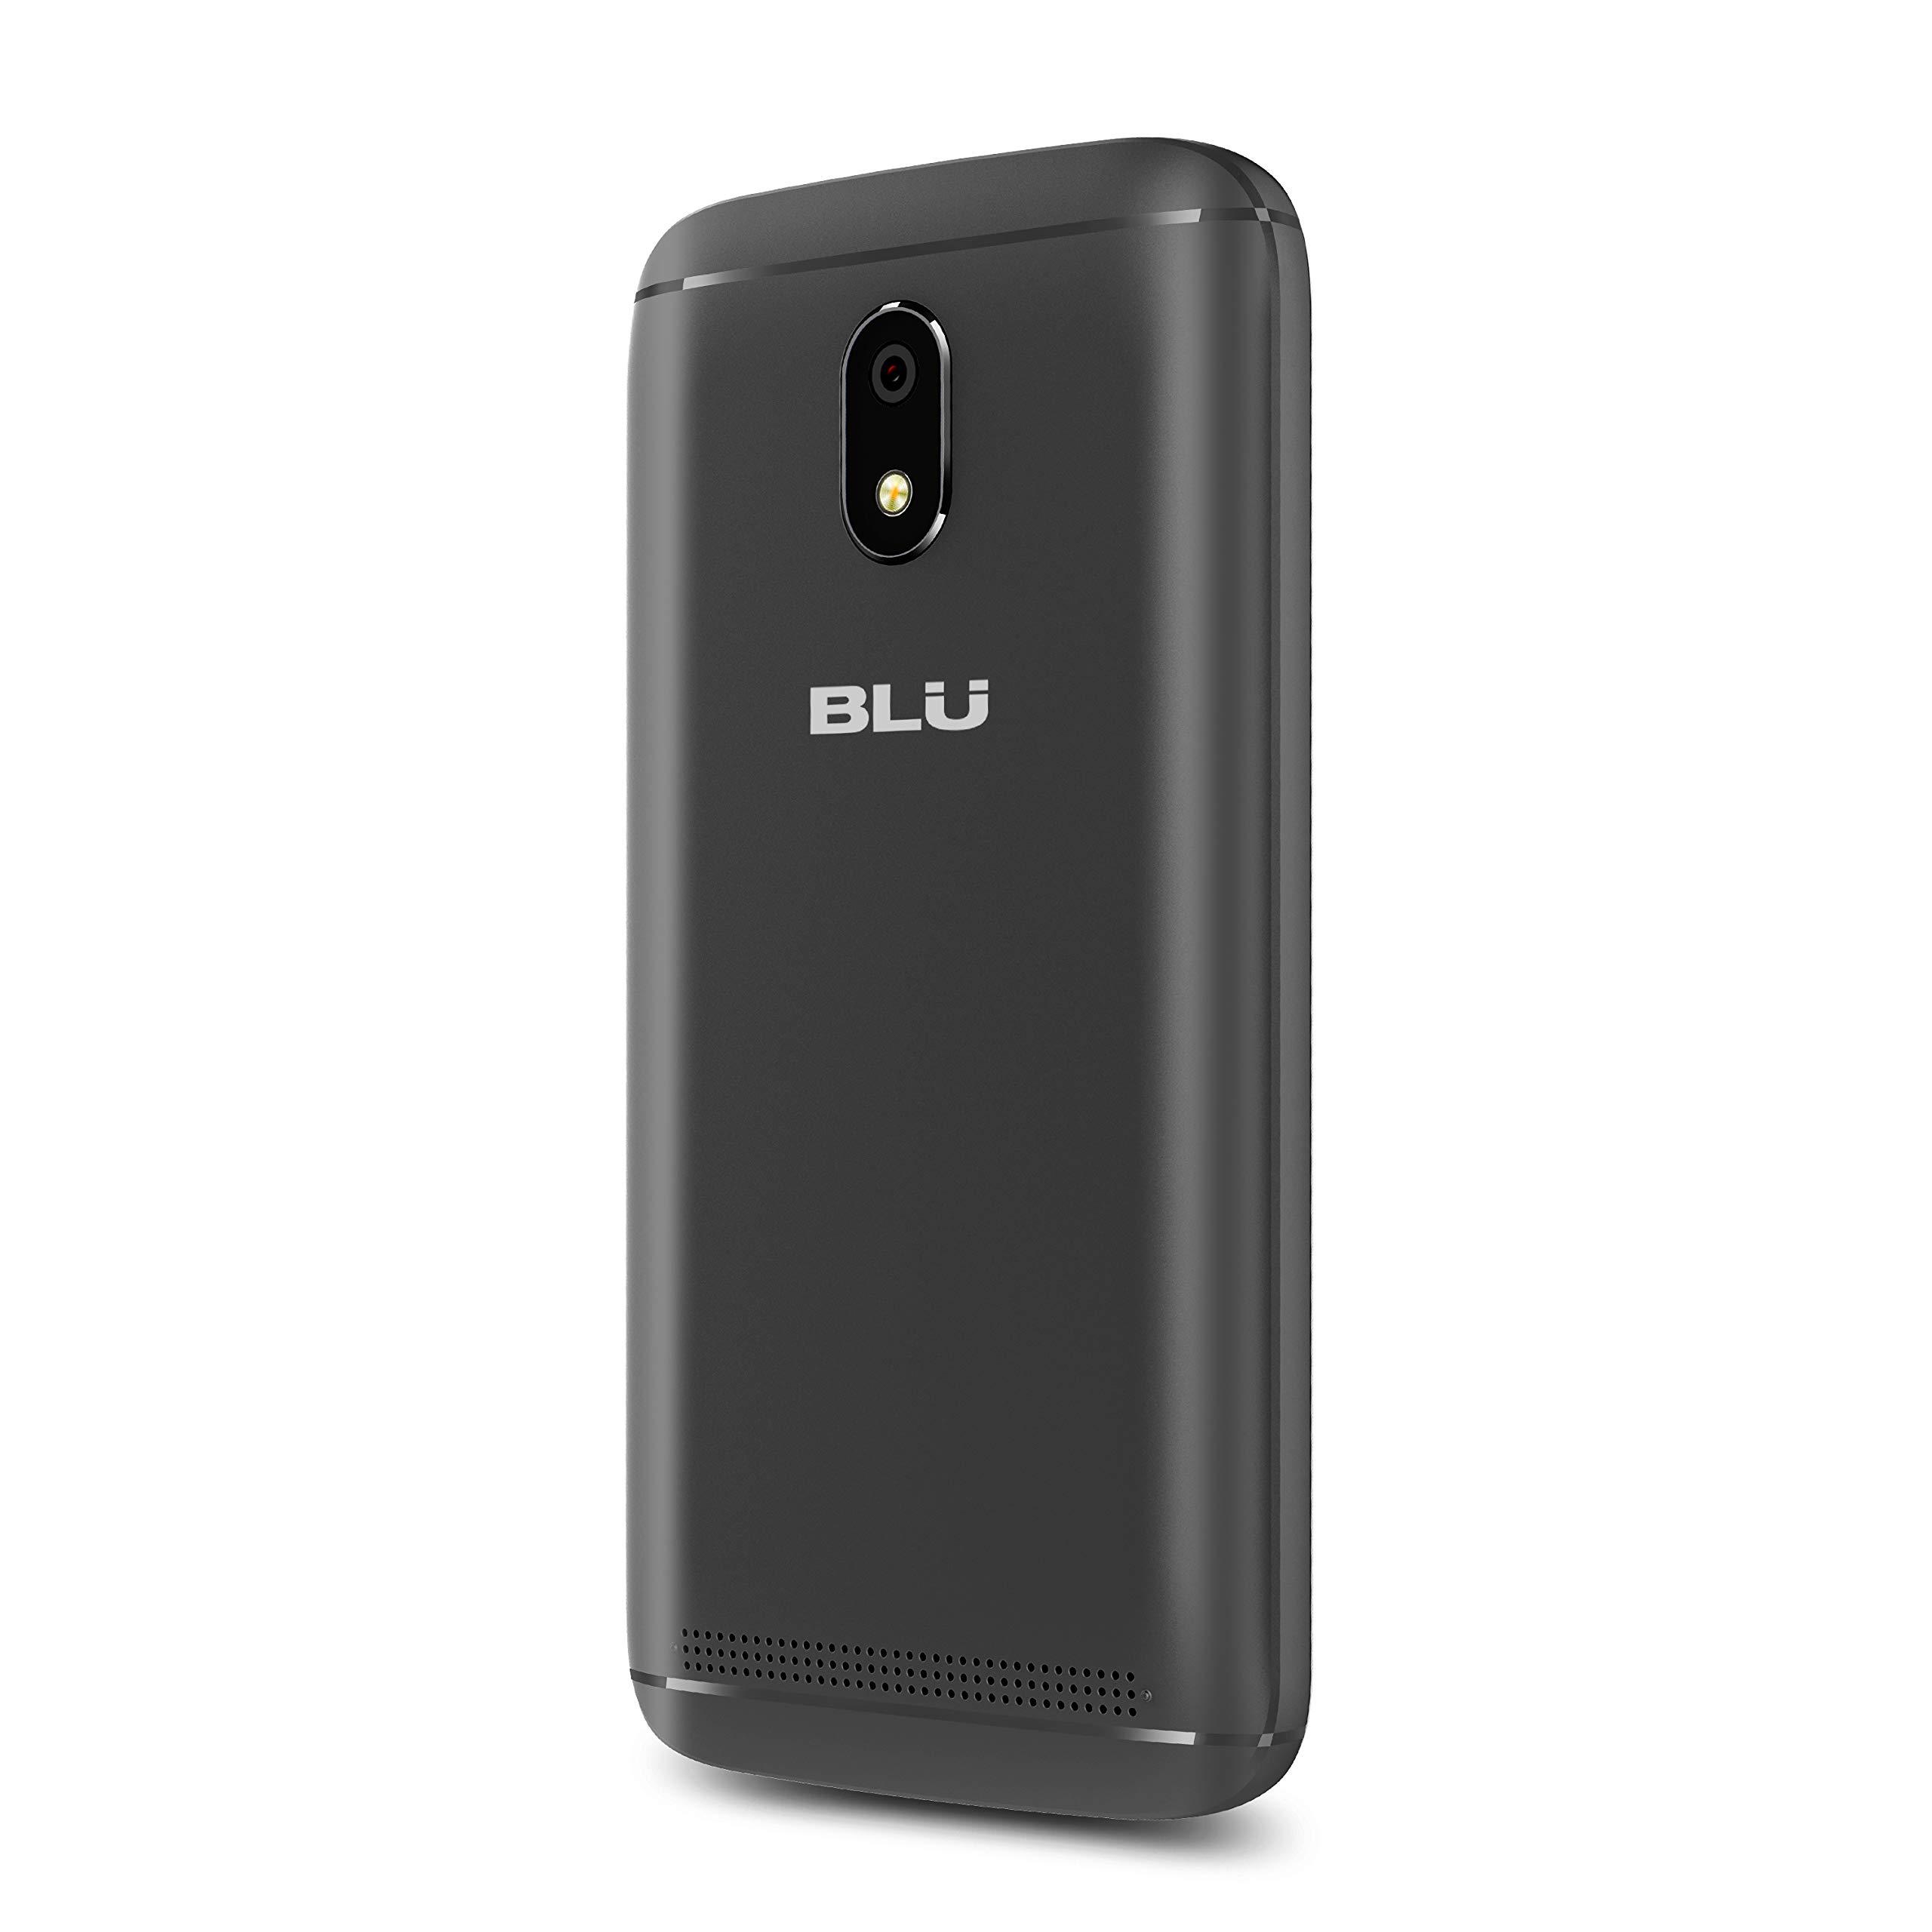 BLU Advance A4 -Unlocked Dual Sim Smartphone -Black by BLU (Image #3)